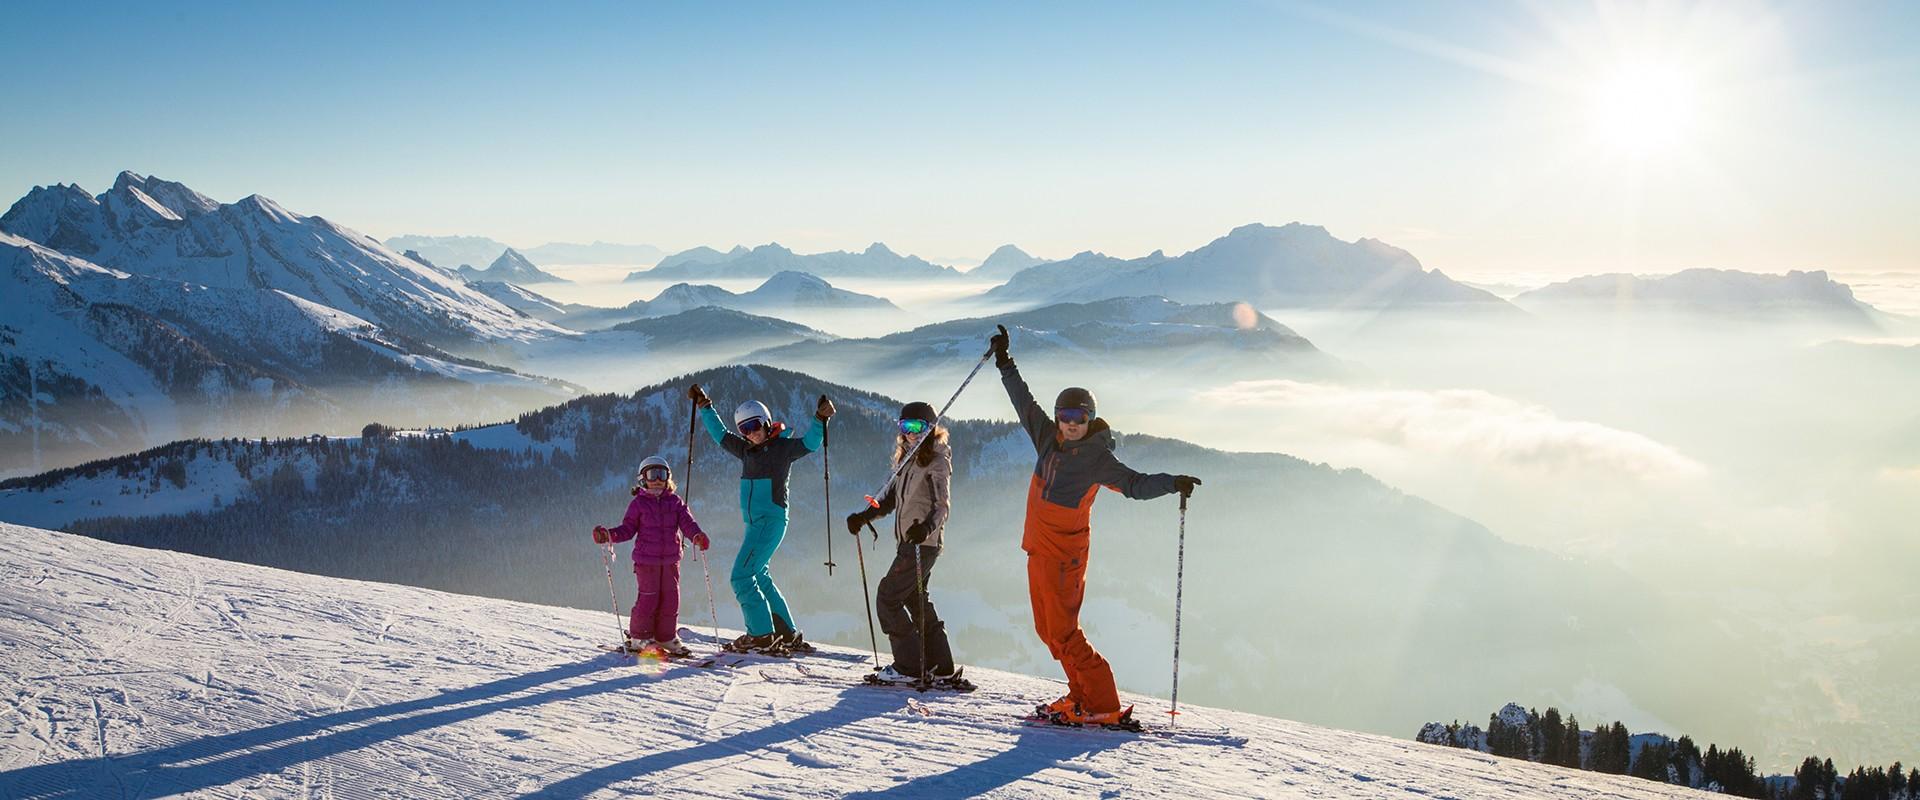 021-a-ski-verapelst-h-17-679